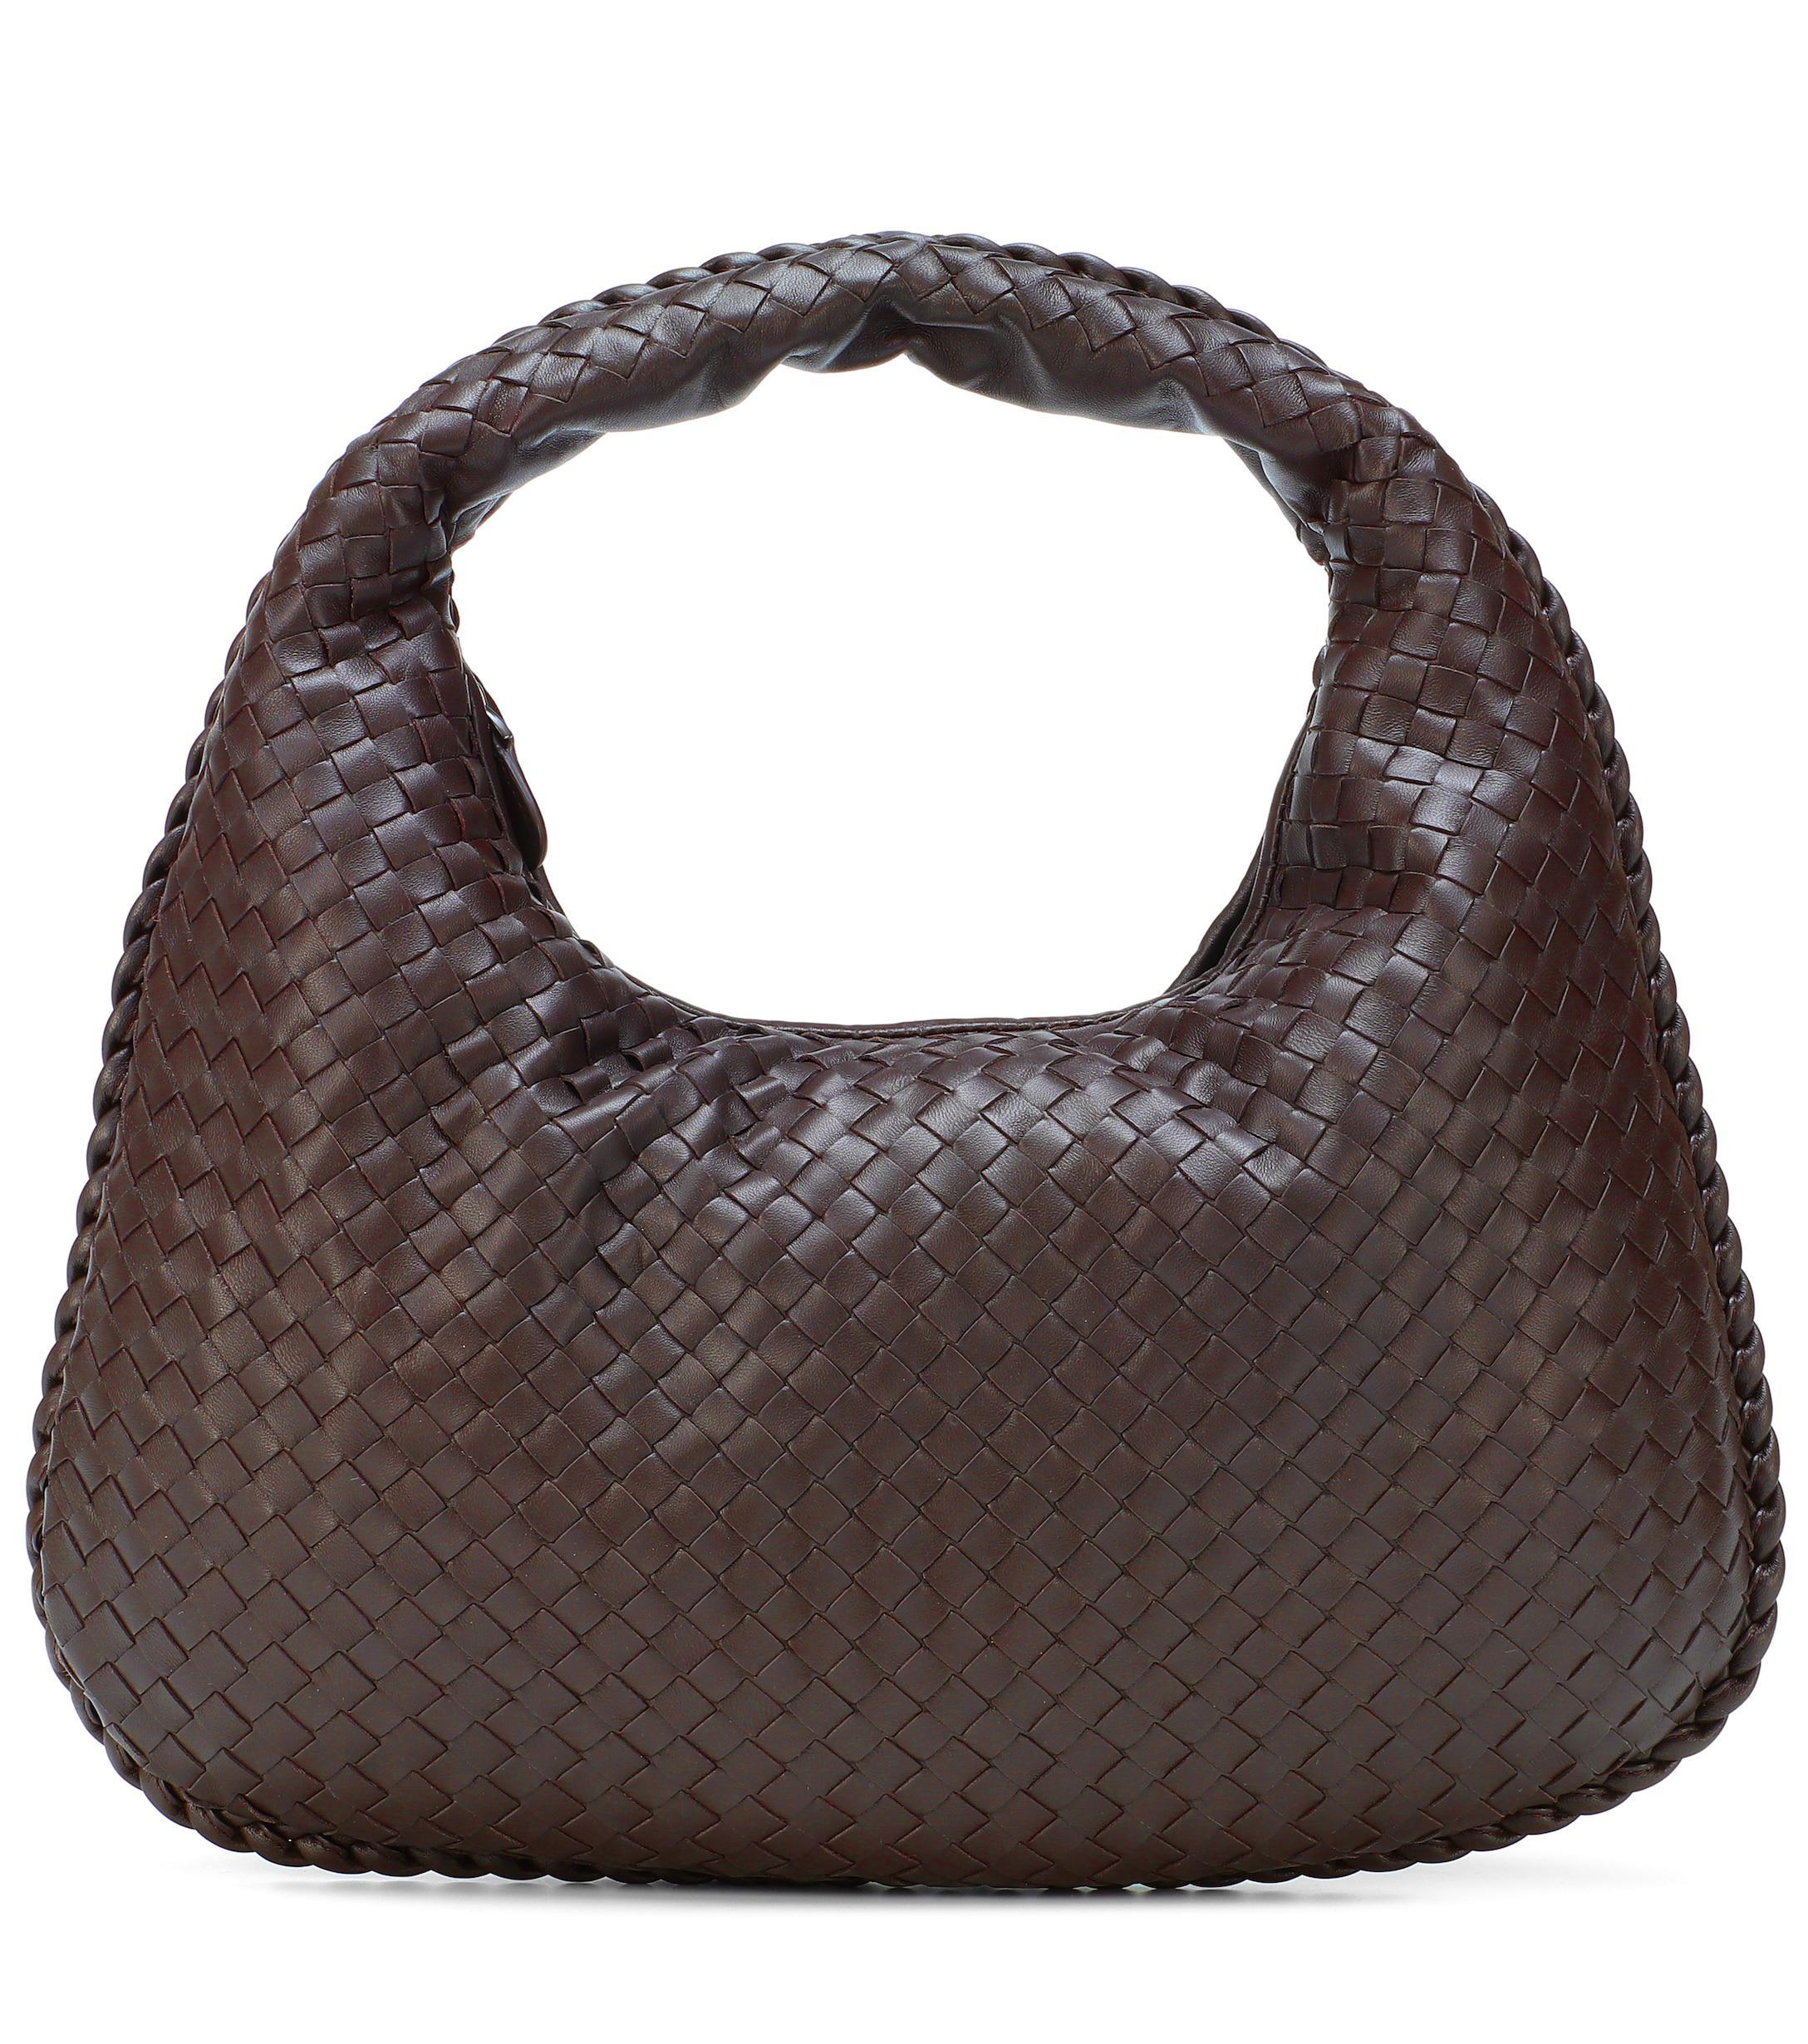 Bottega Veneta Veneta Medium Leather Shoulder Bag in Brown - Lyst 4de26c7f147d2